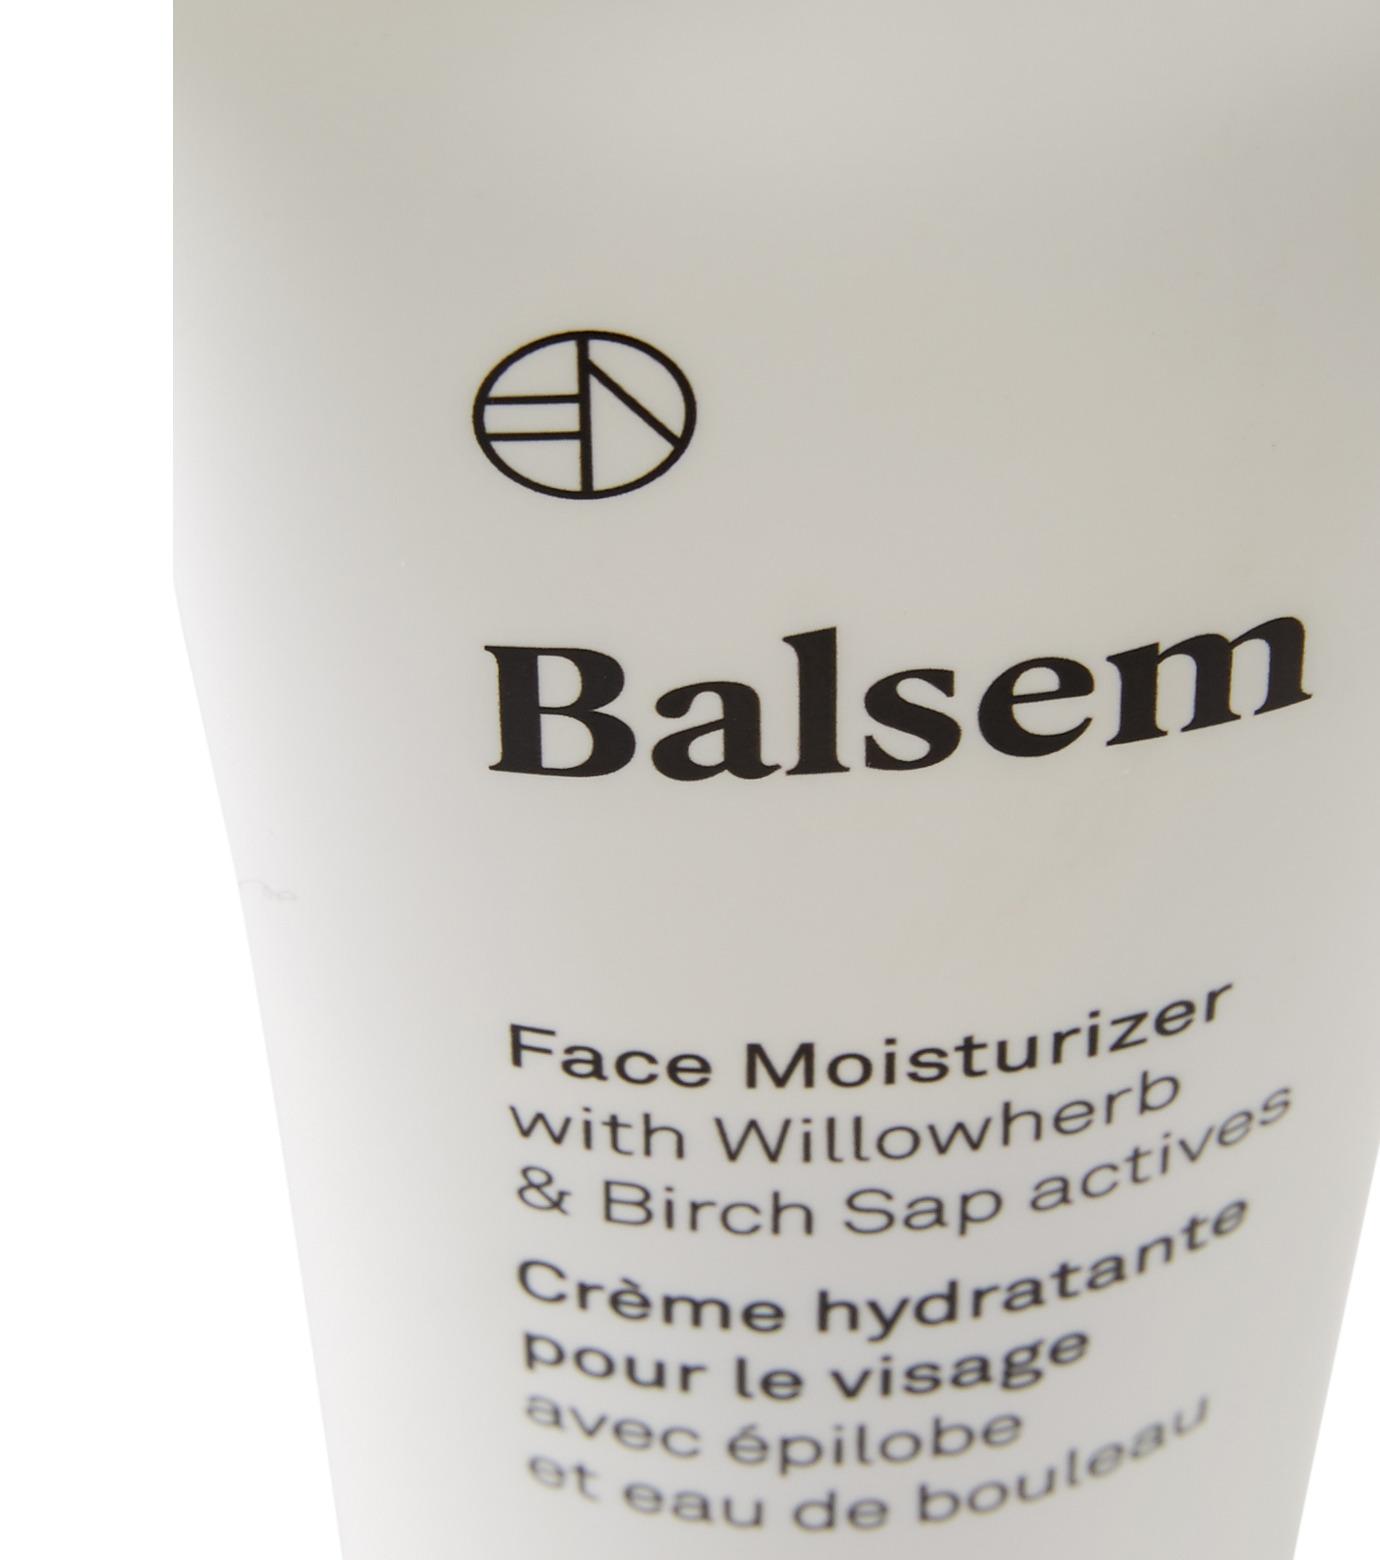 BALSEM()のSHAVE CREAM 110g-WHITE(BATH-BODY-GROOMING/BATH-BODY-GROOMING)-MS-31018B-4 拡大詳細画像2